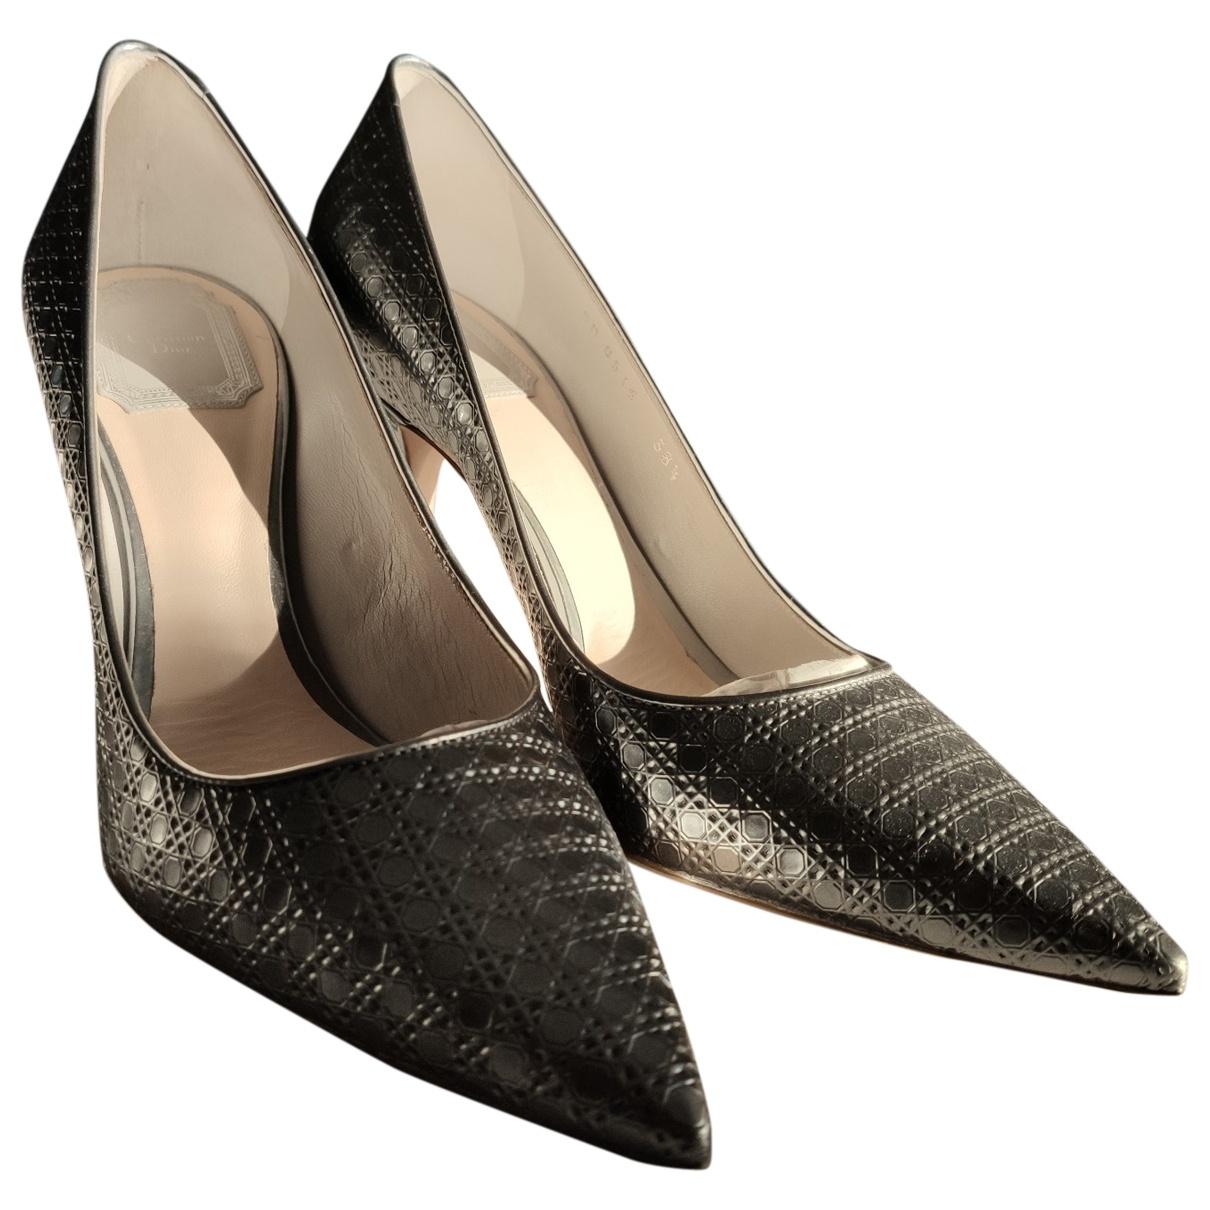 Dior Dior D-Stiletto Silver Leather Heels for Women 38.5 EU